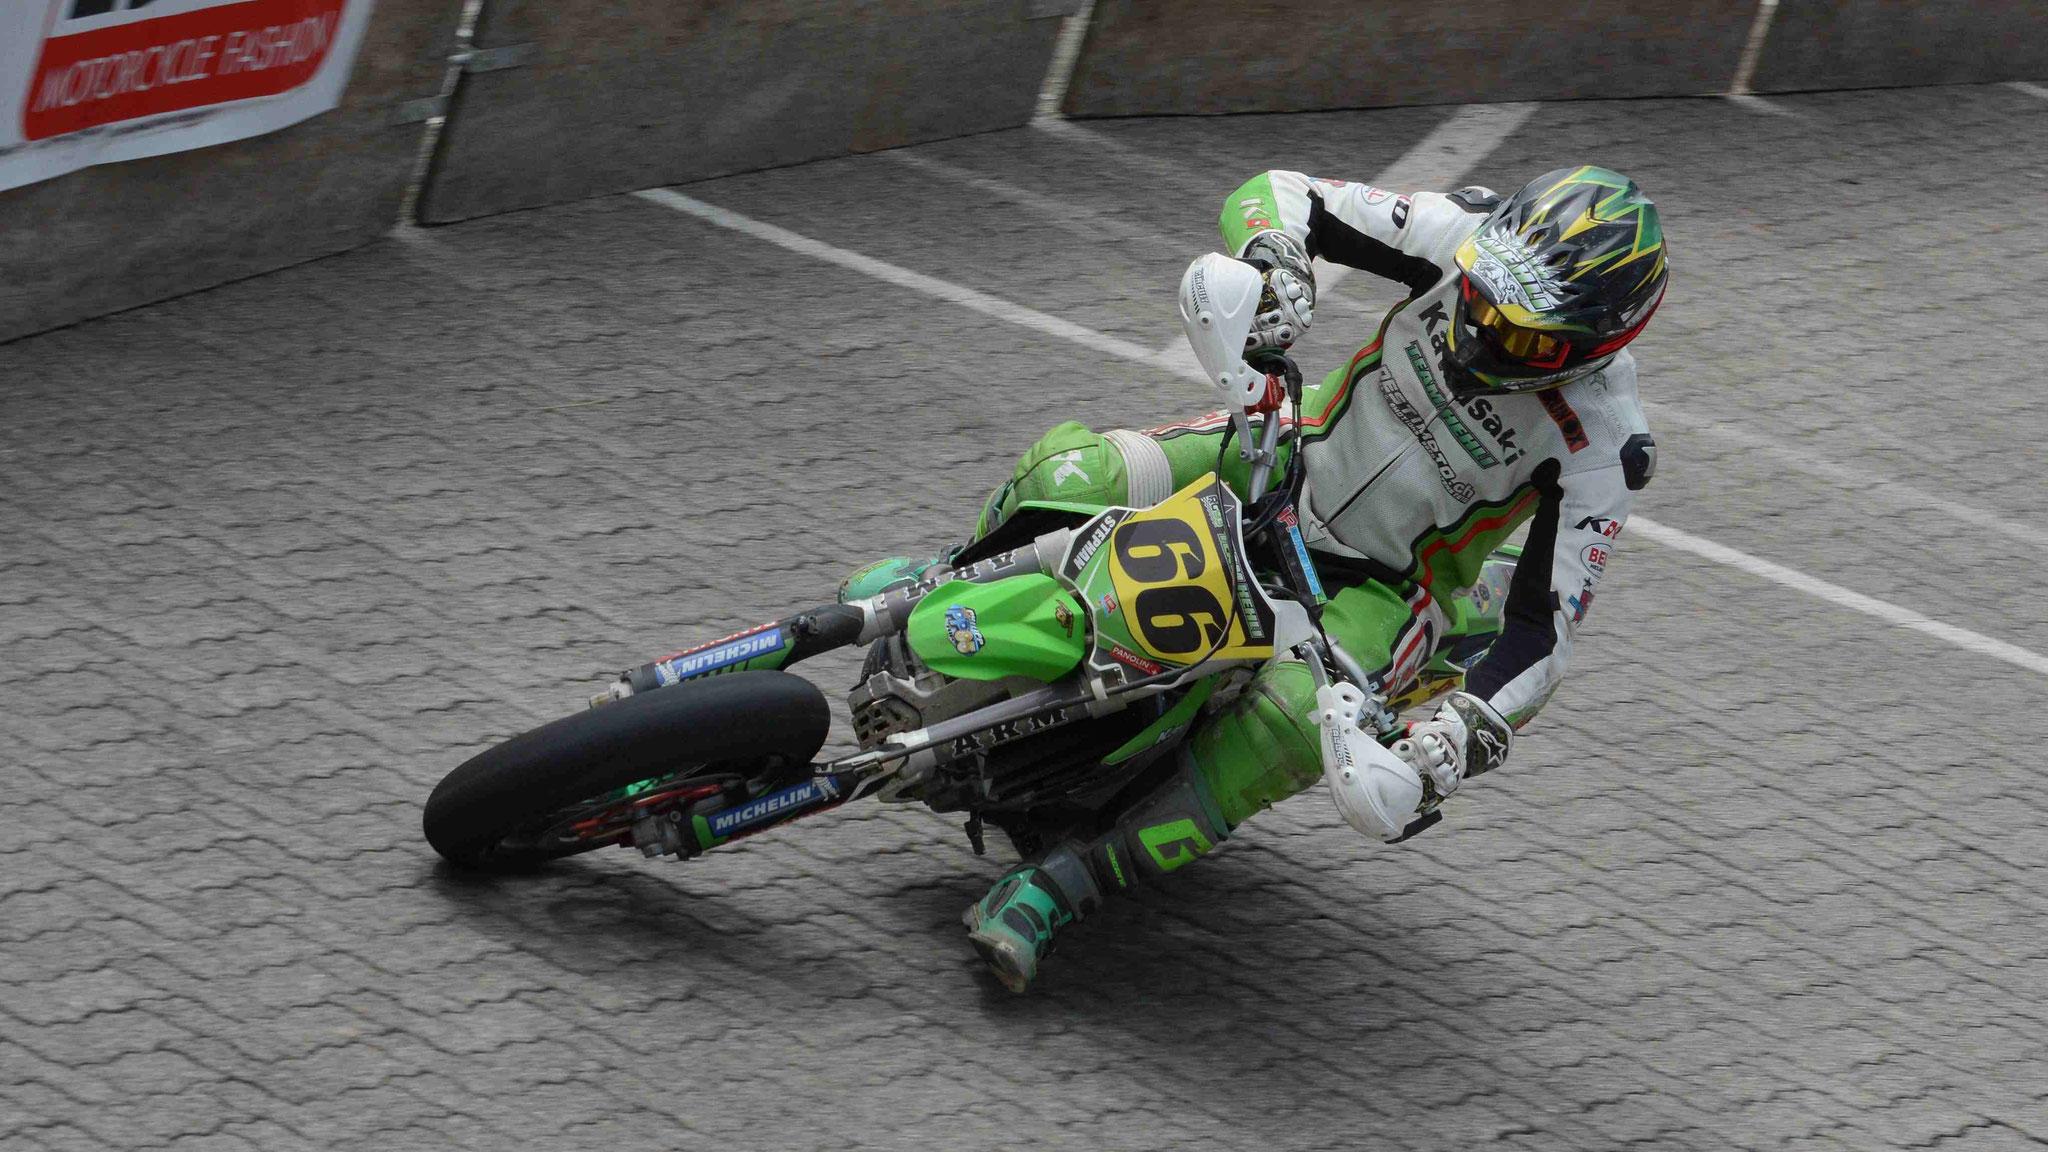 #66 Stephan Züger - Kawasaki